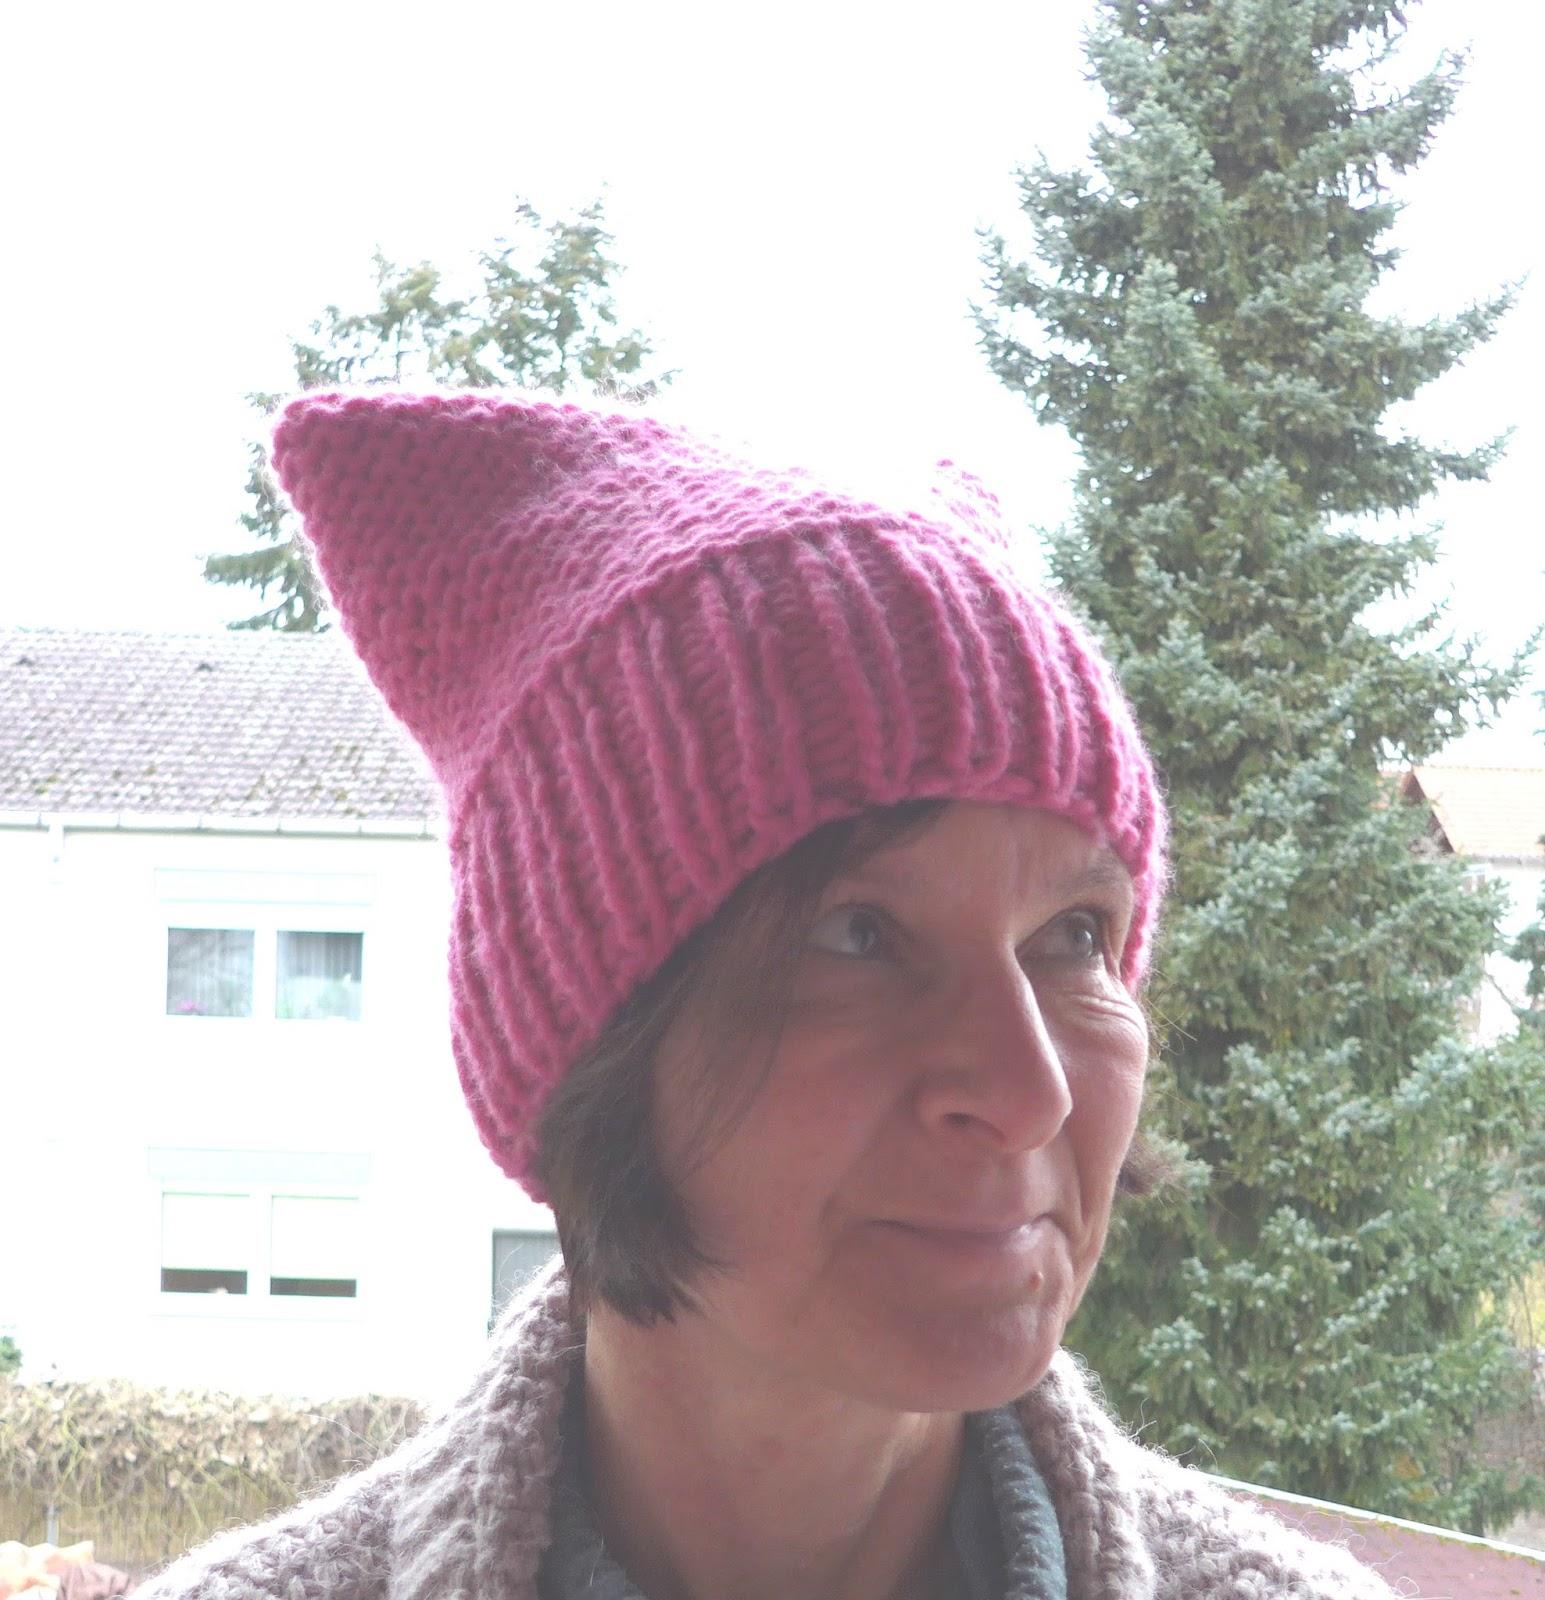 Blck www. rico pussy. com welt